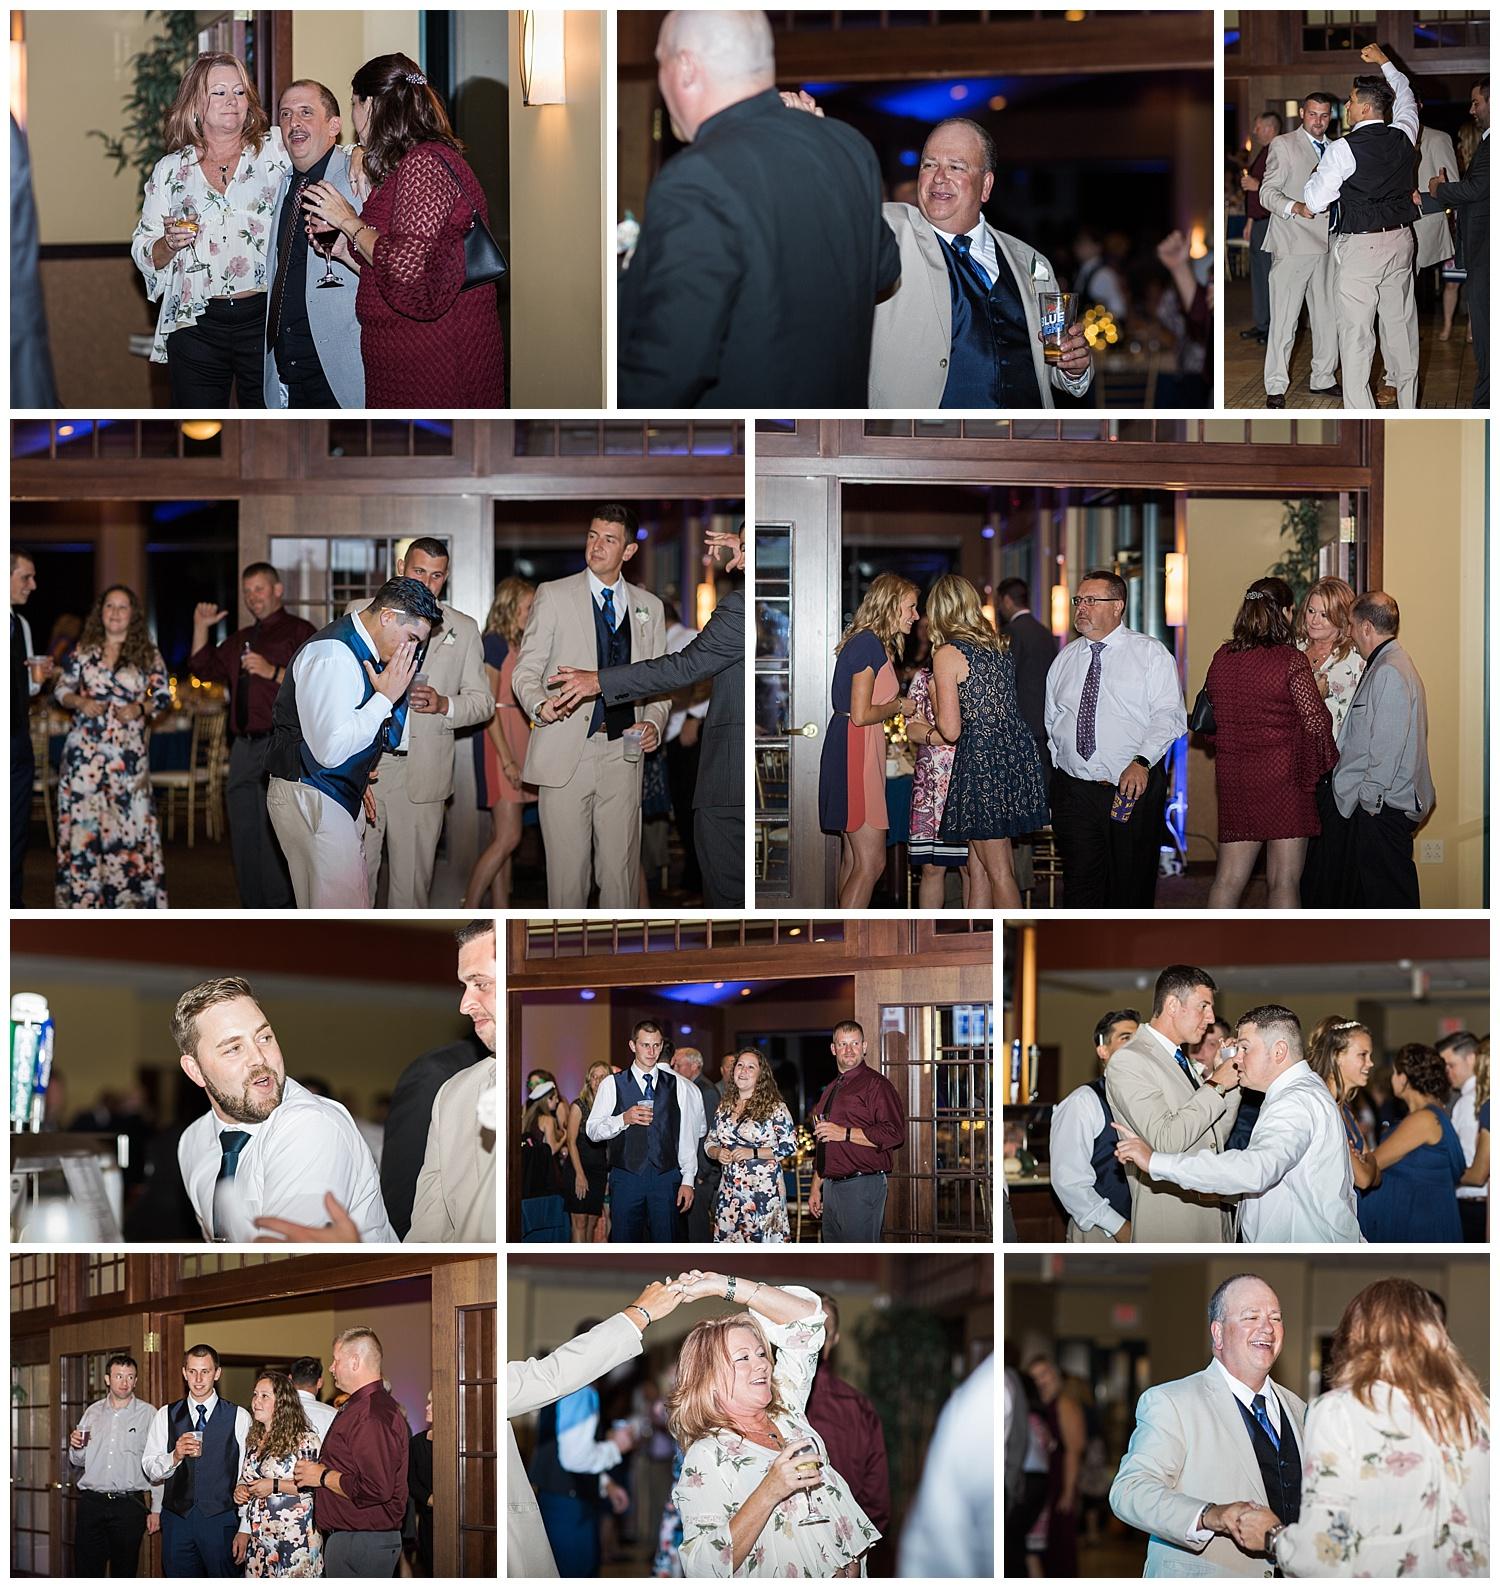 Jessica and Scott McKay - Terry Hills Golf Course - Batavia NY - Lass and Beau-1224_Buffalo wedding photography.jpg